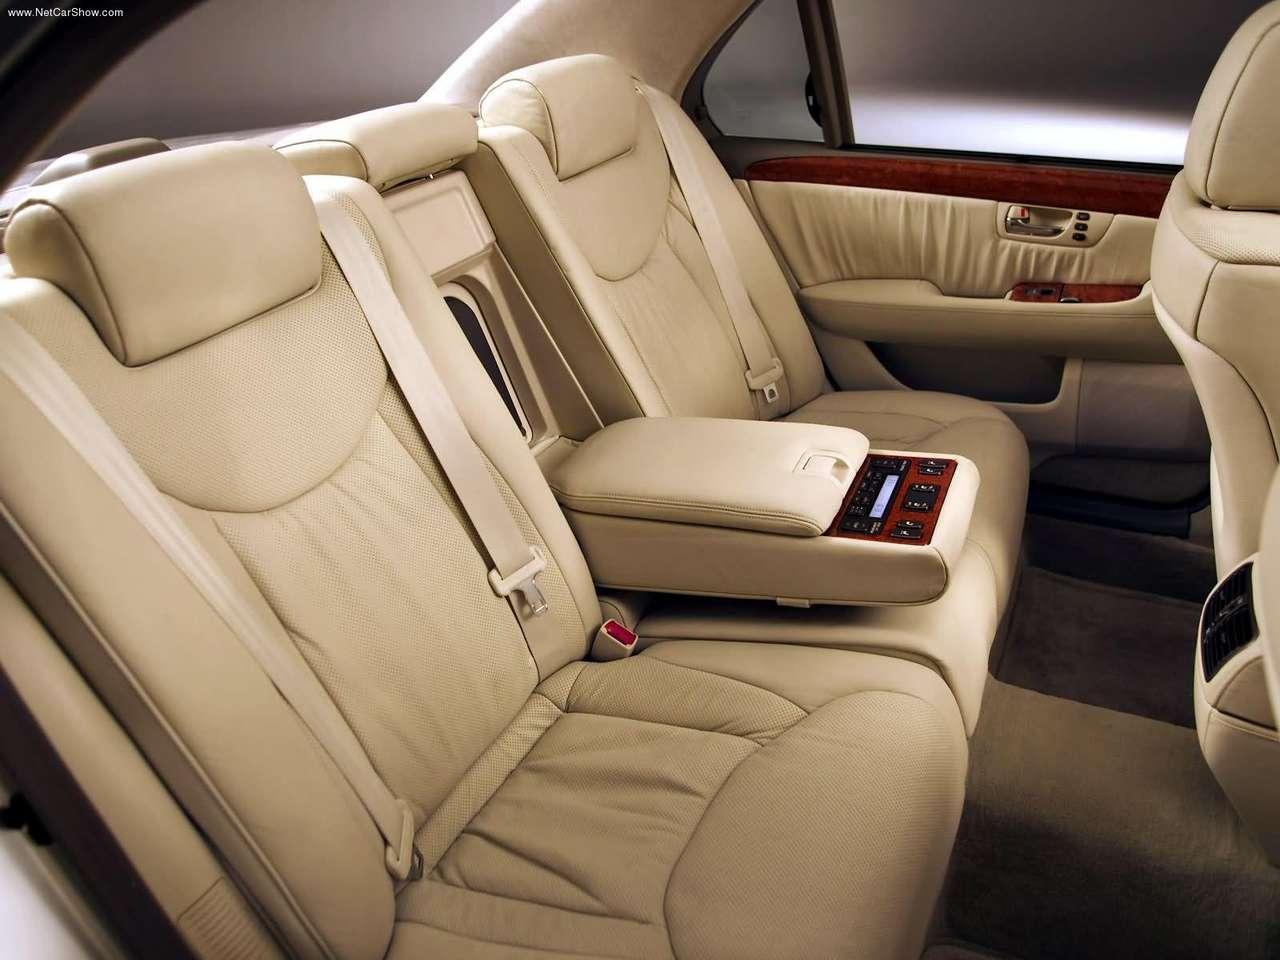 Lexus, Lexus LS, Lexus LS430, omotenashi, takumi, luxury car, expensive car, saloon, luxury saloon, Japan, Japanese car, Akio Toyoda, Toyots, motoring, automotive, featured, ebay, ebay motors, Adrian Flux, not 2 grand, www.not2grand.co.uk, car, cars, classic car, retro car, used car, cheap car, cay buying. LS430 bying guide, Lexus buying guide,